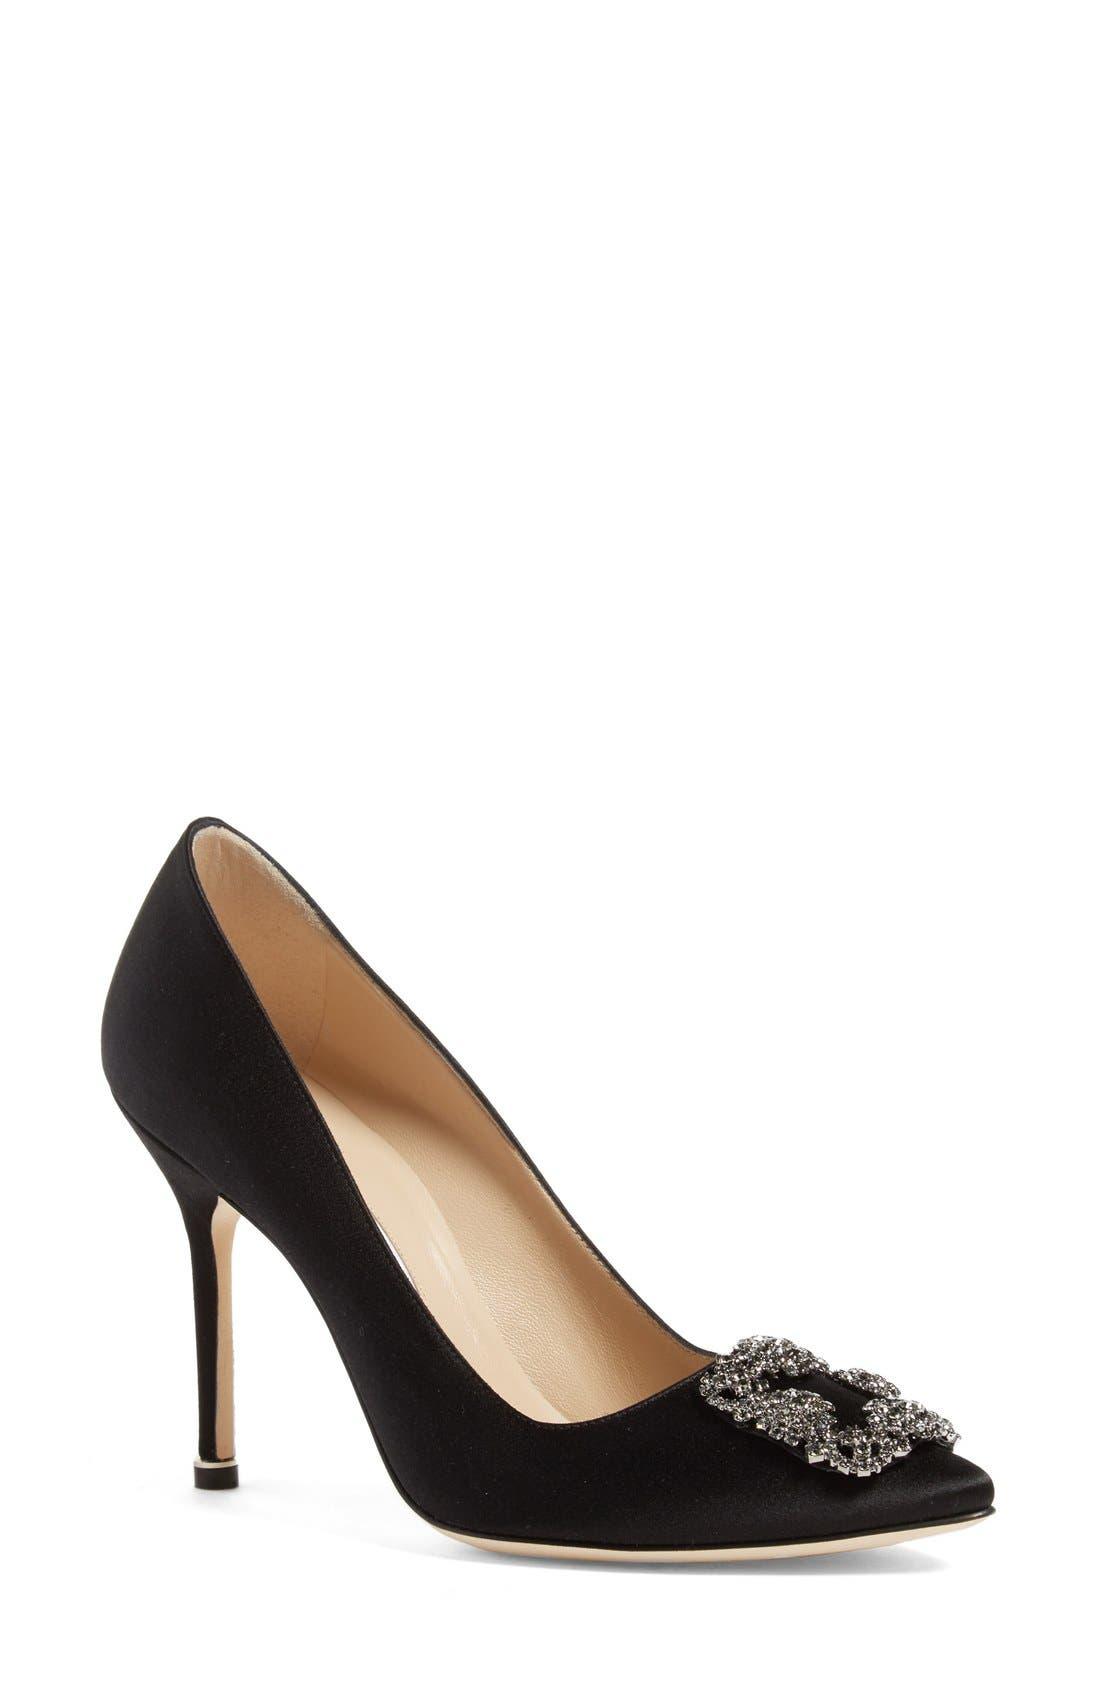 b7ff29c93cc44 real shoes court heels manolo blahnik satin hangisi pumps 50 589da e77c3;  france manolo blahnik hangisi jewel pump women nordstrom 29219 4b9b2